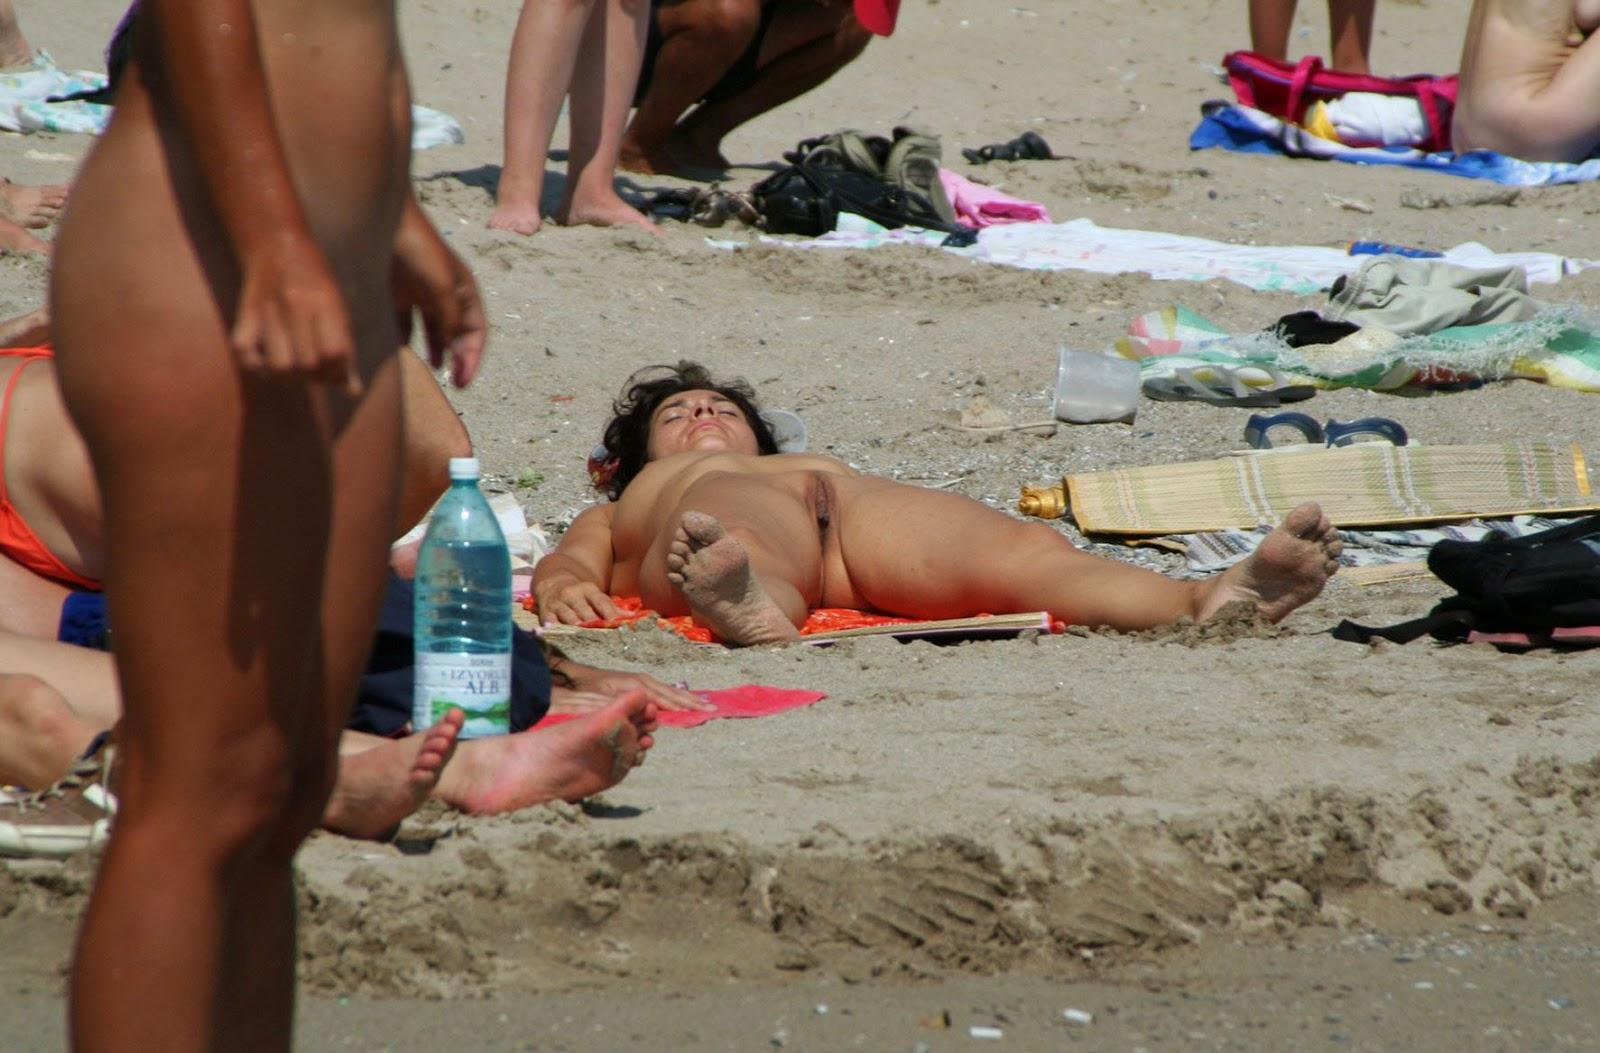 я сняла фото на нудистком пляже